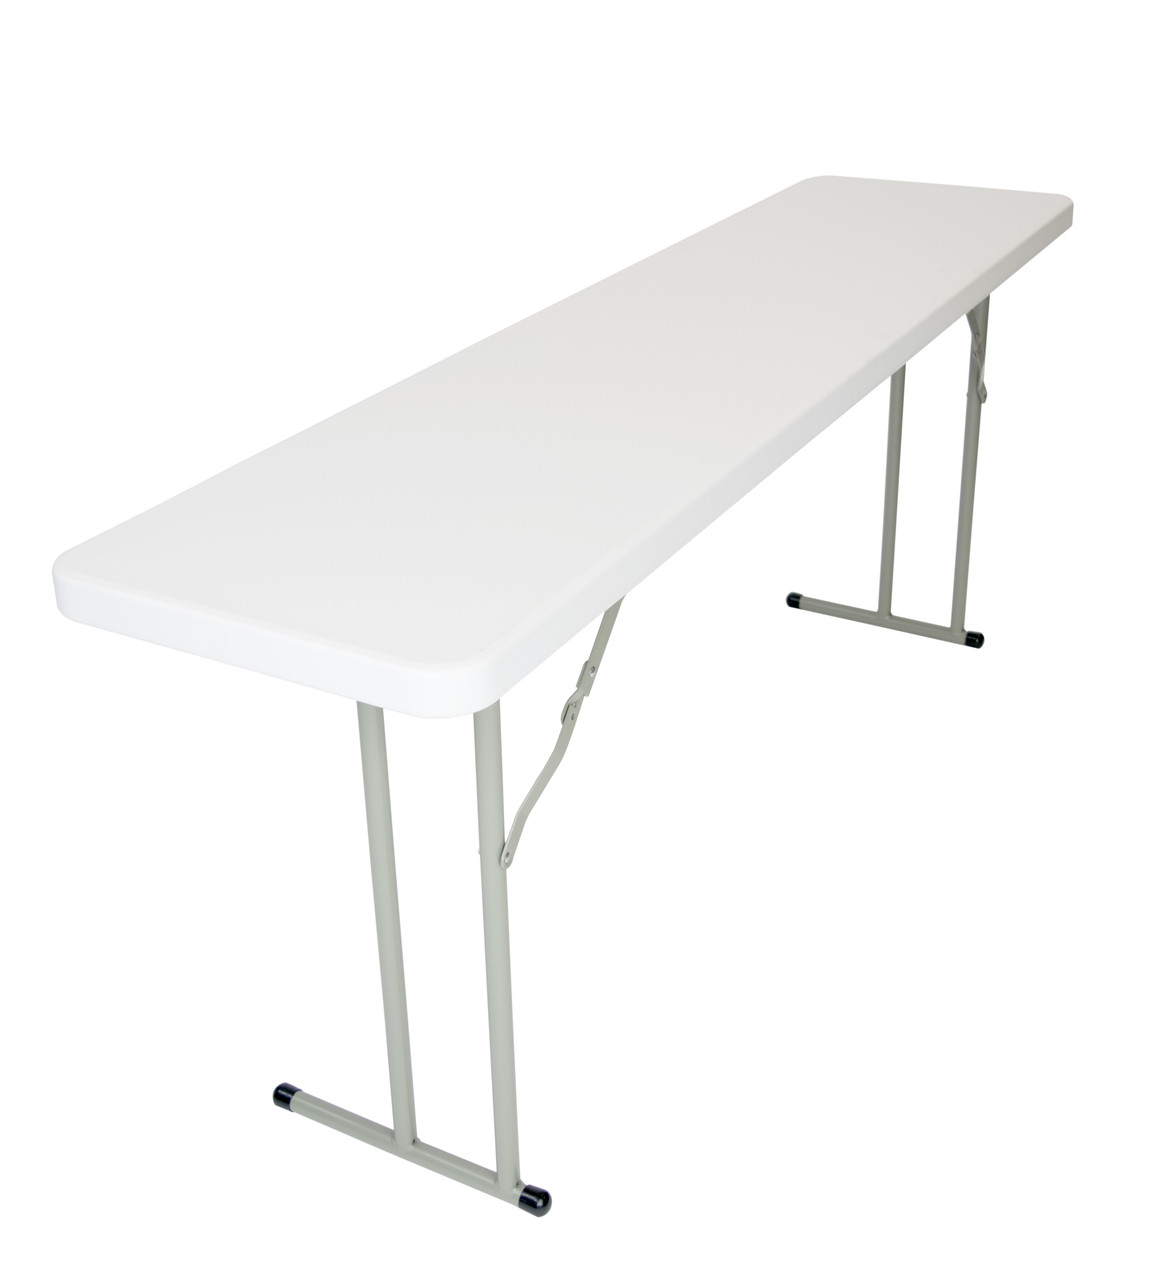 Rhinolite 18 X96 8 Ft Seminar Plastic Folding Table Solid One Piece Top Locking Steel Frame Foldingchairsandtables Com